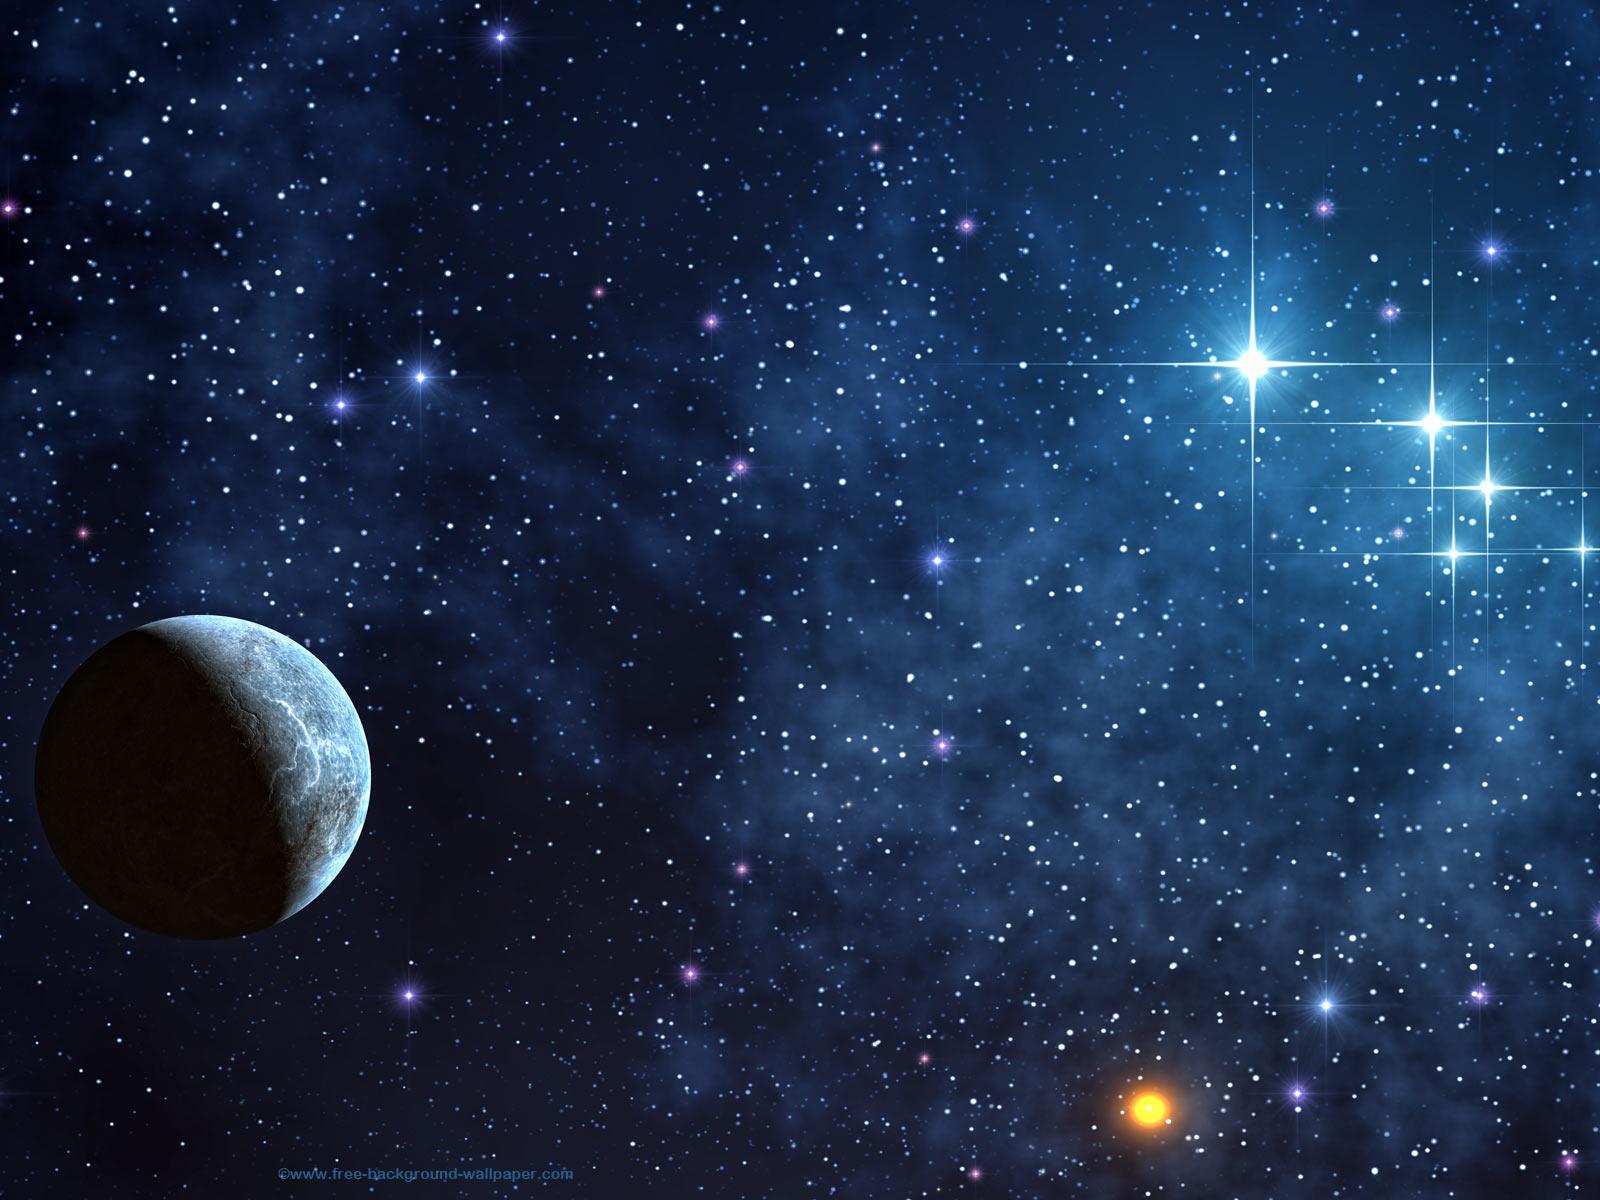 Wallpapersafari: Space Stars Background